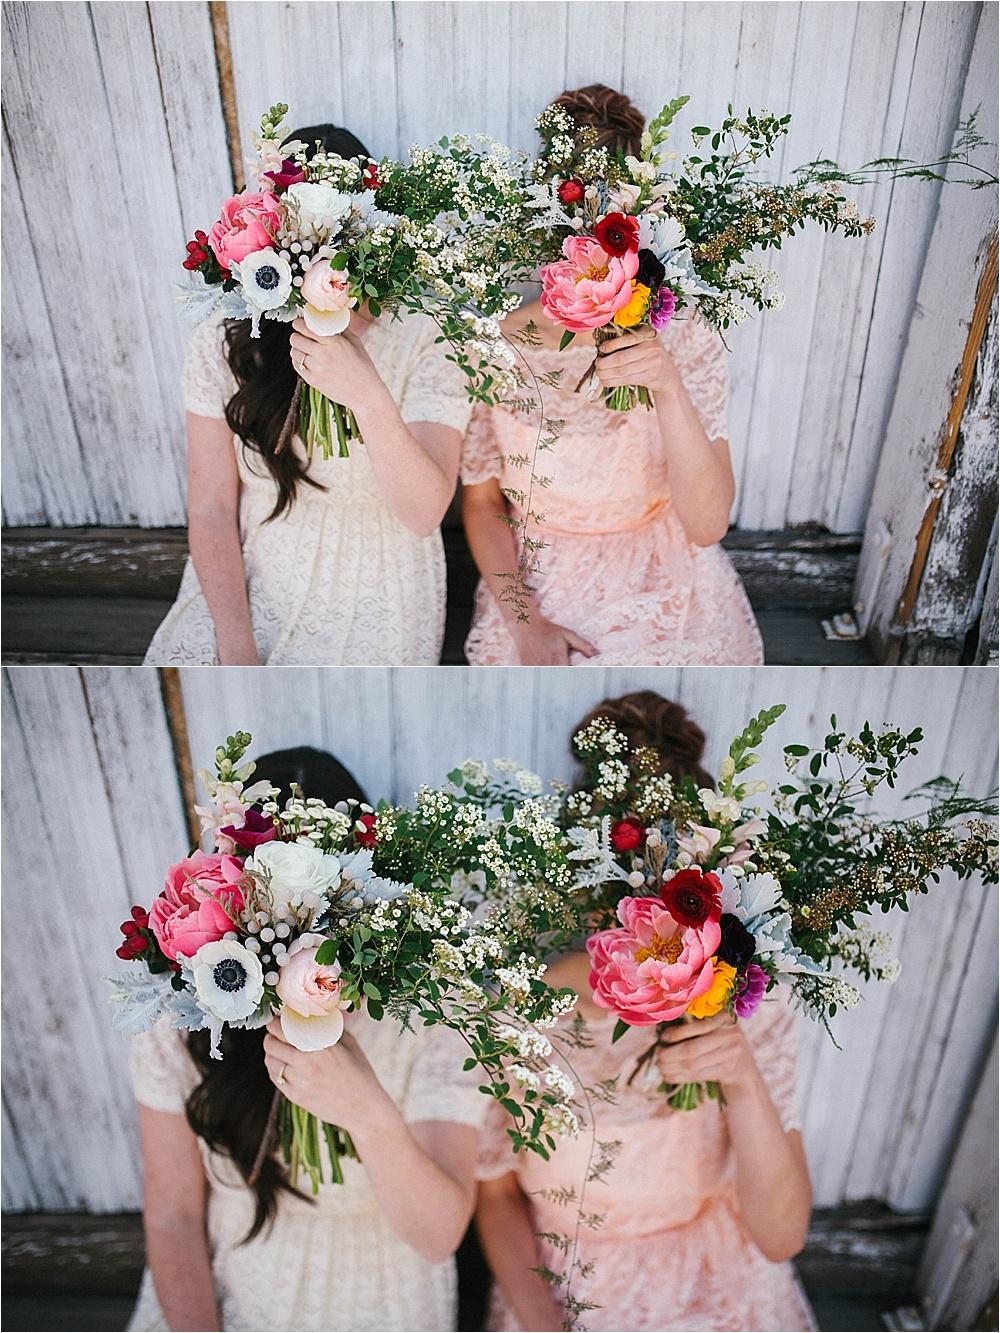 manzanita photo by rebecca caridad wedding lifestlye photography floral design calligraphy_1265.jpg